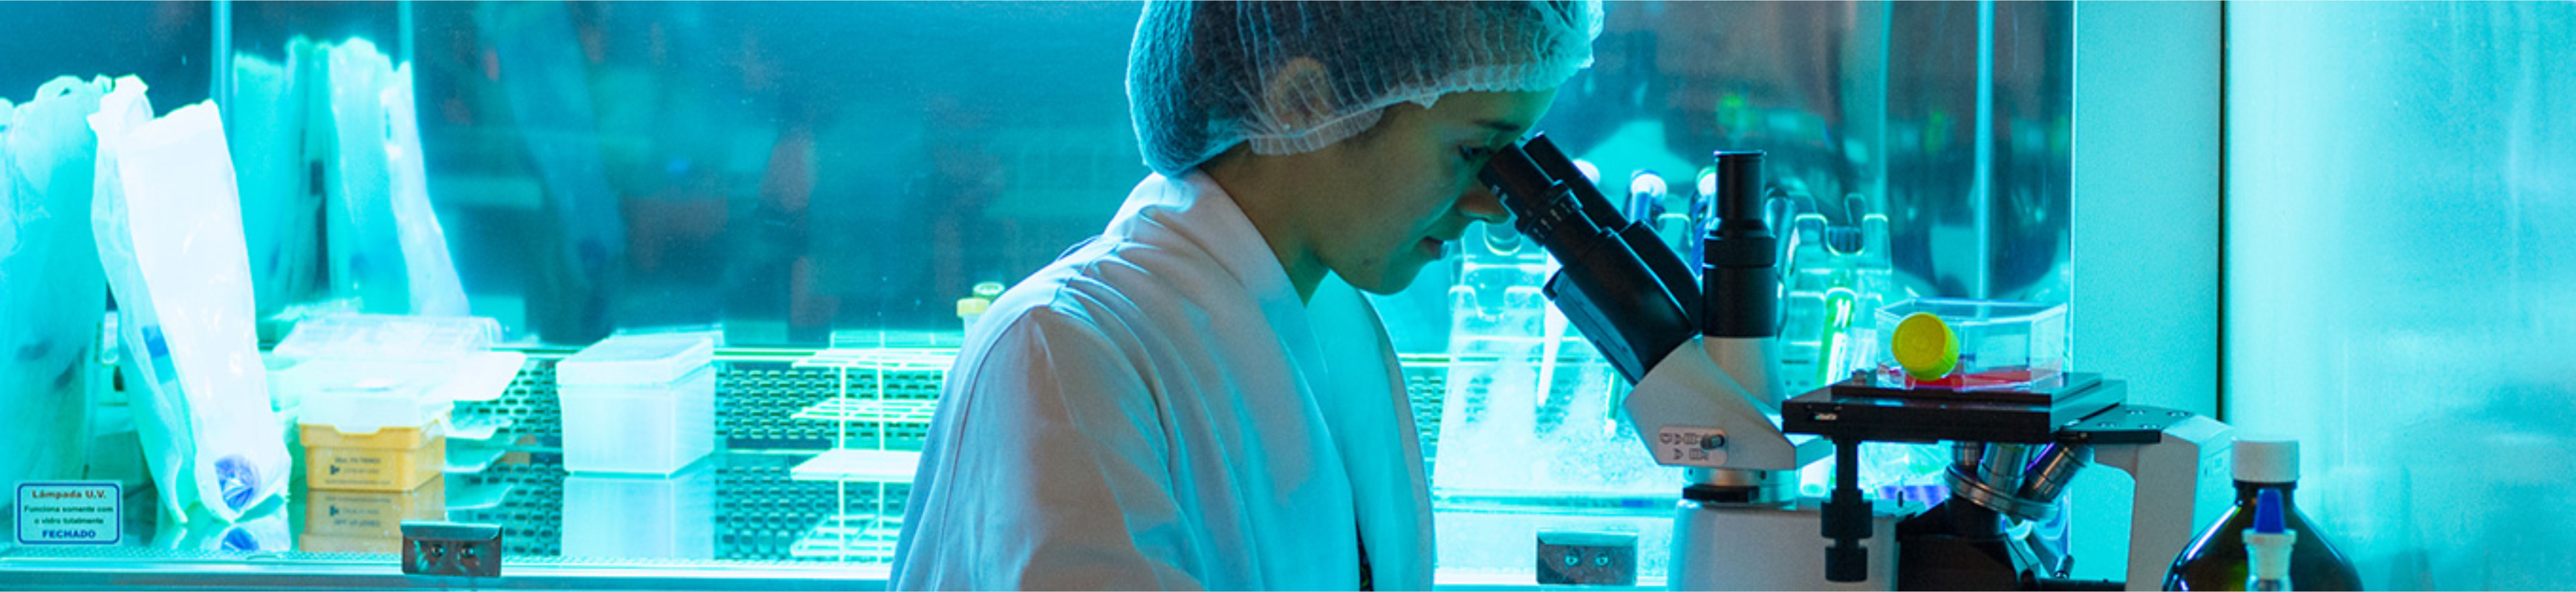 biomédico microscópio